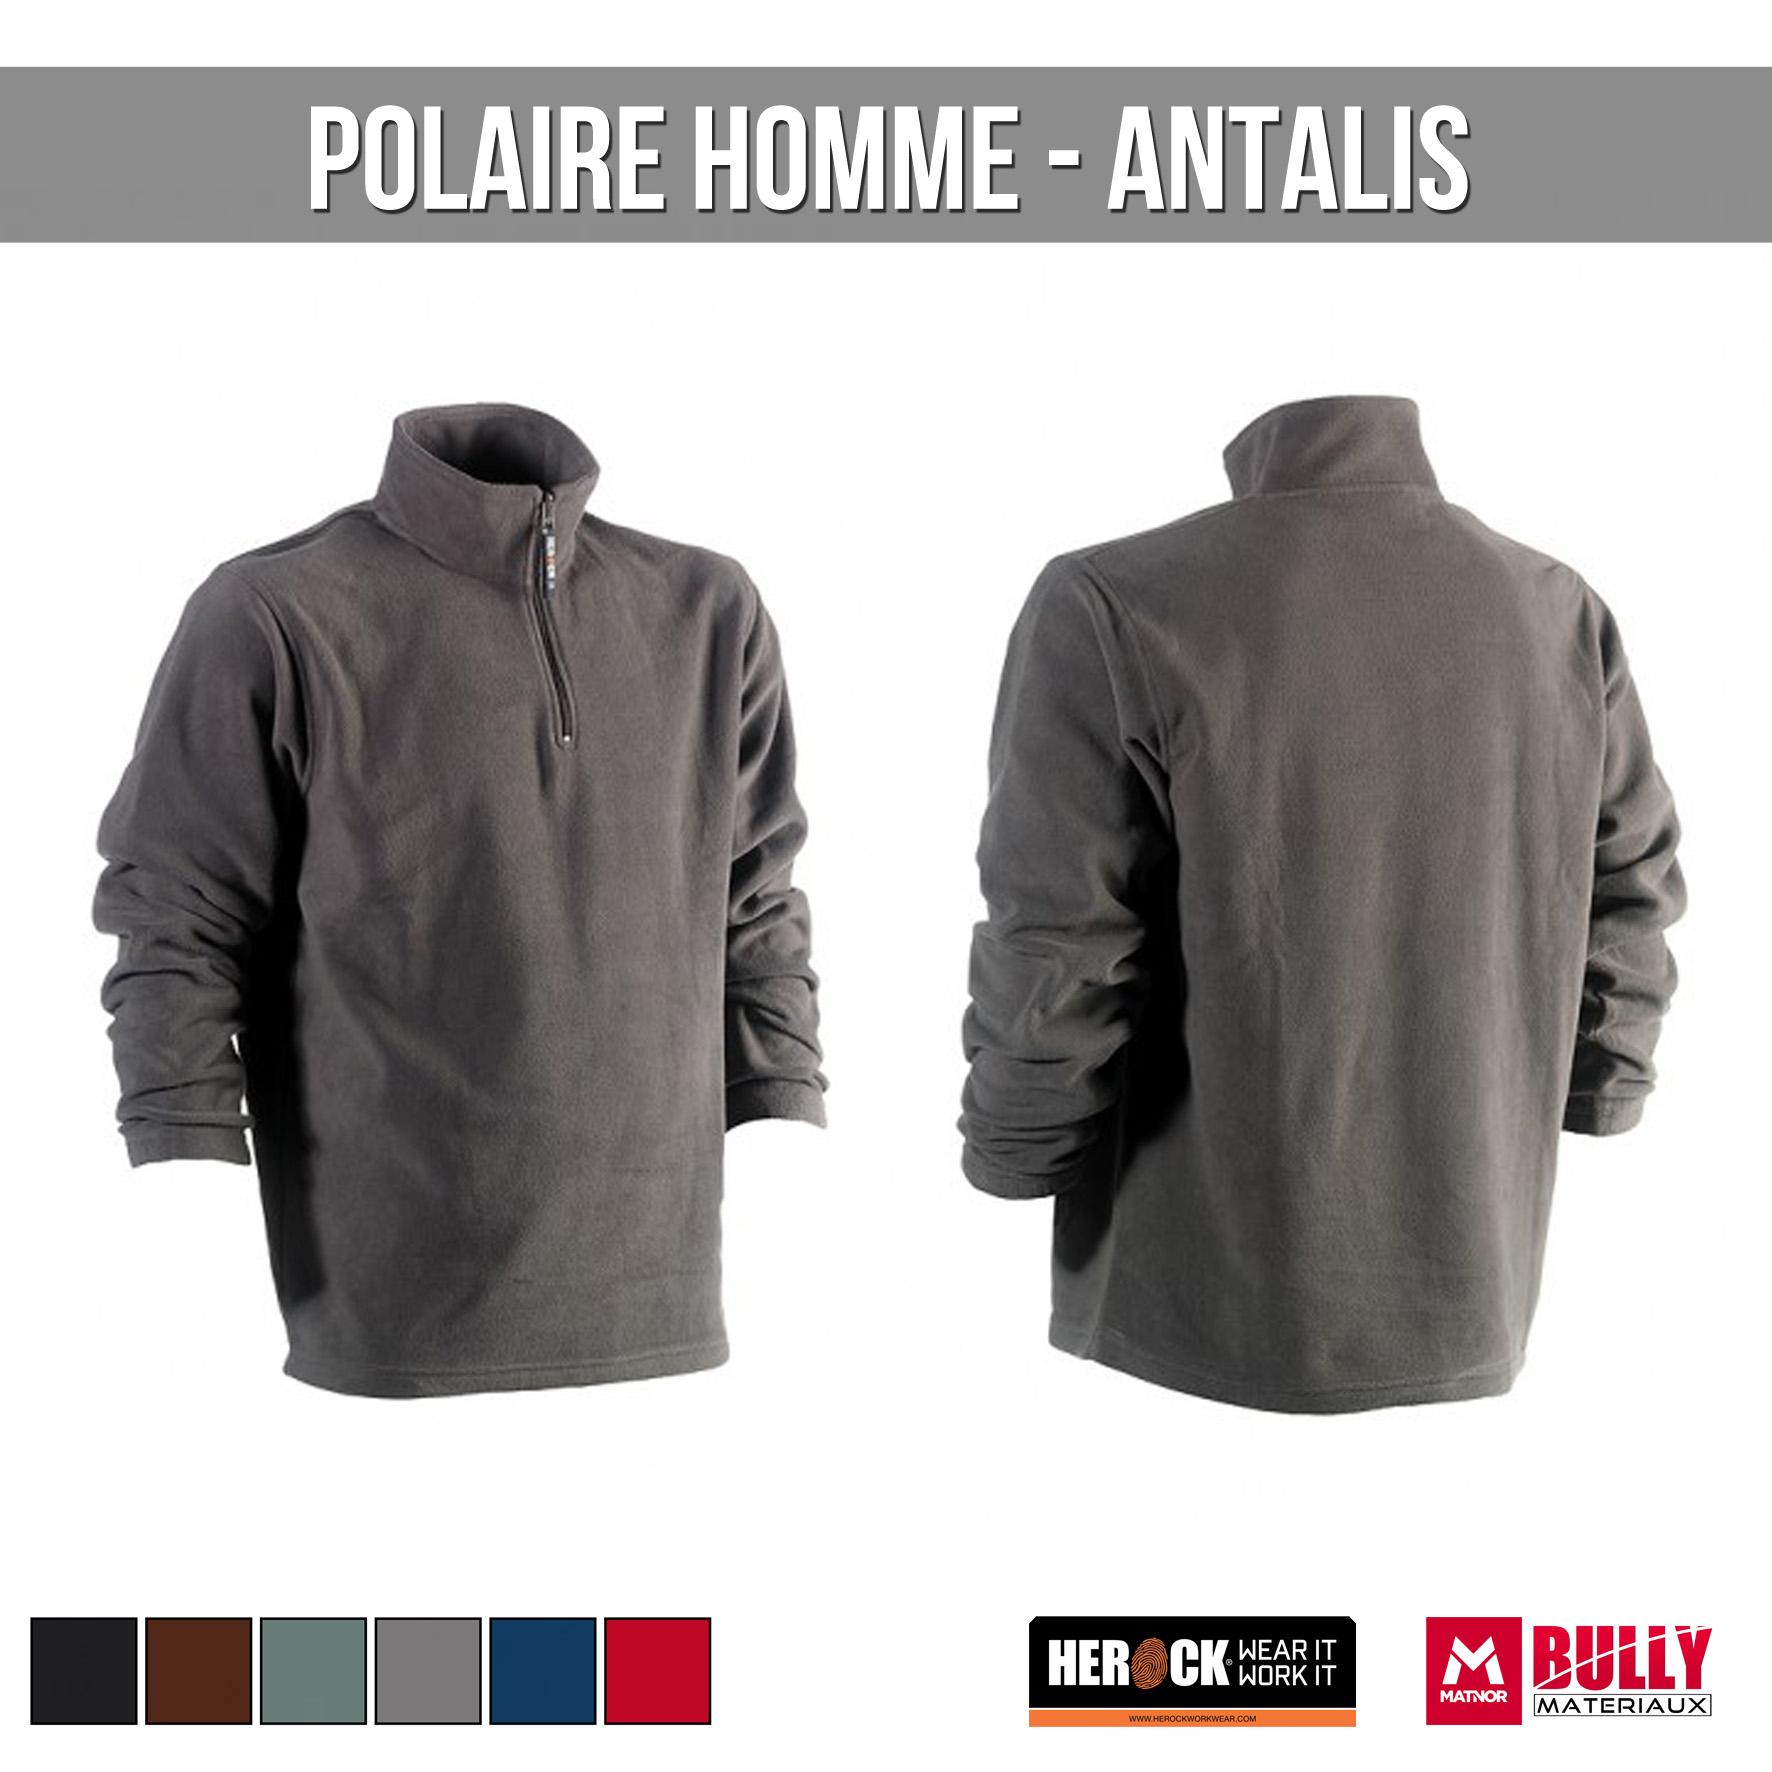 Polaire homme antalis